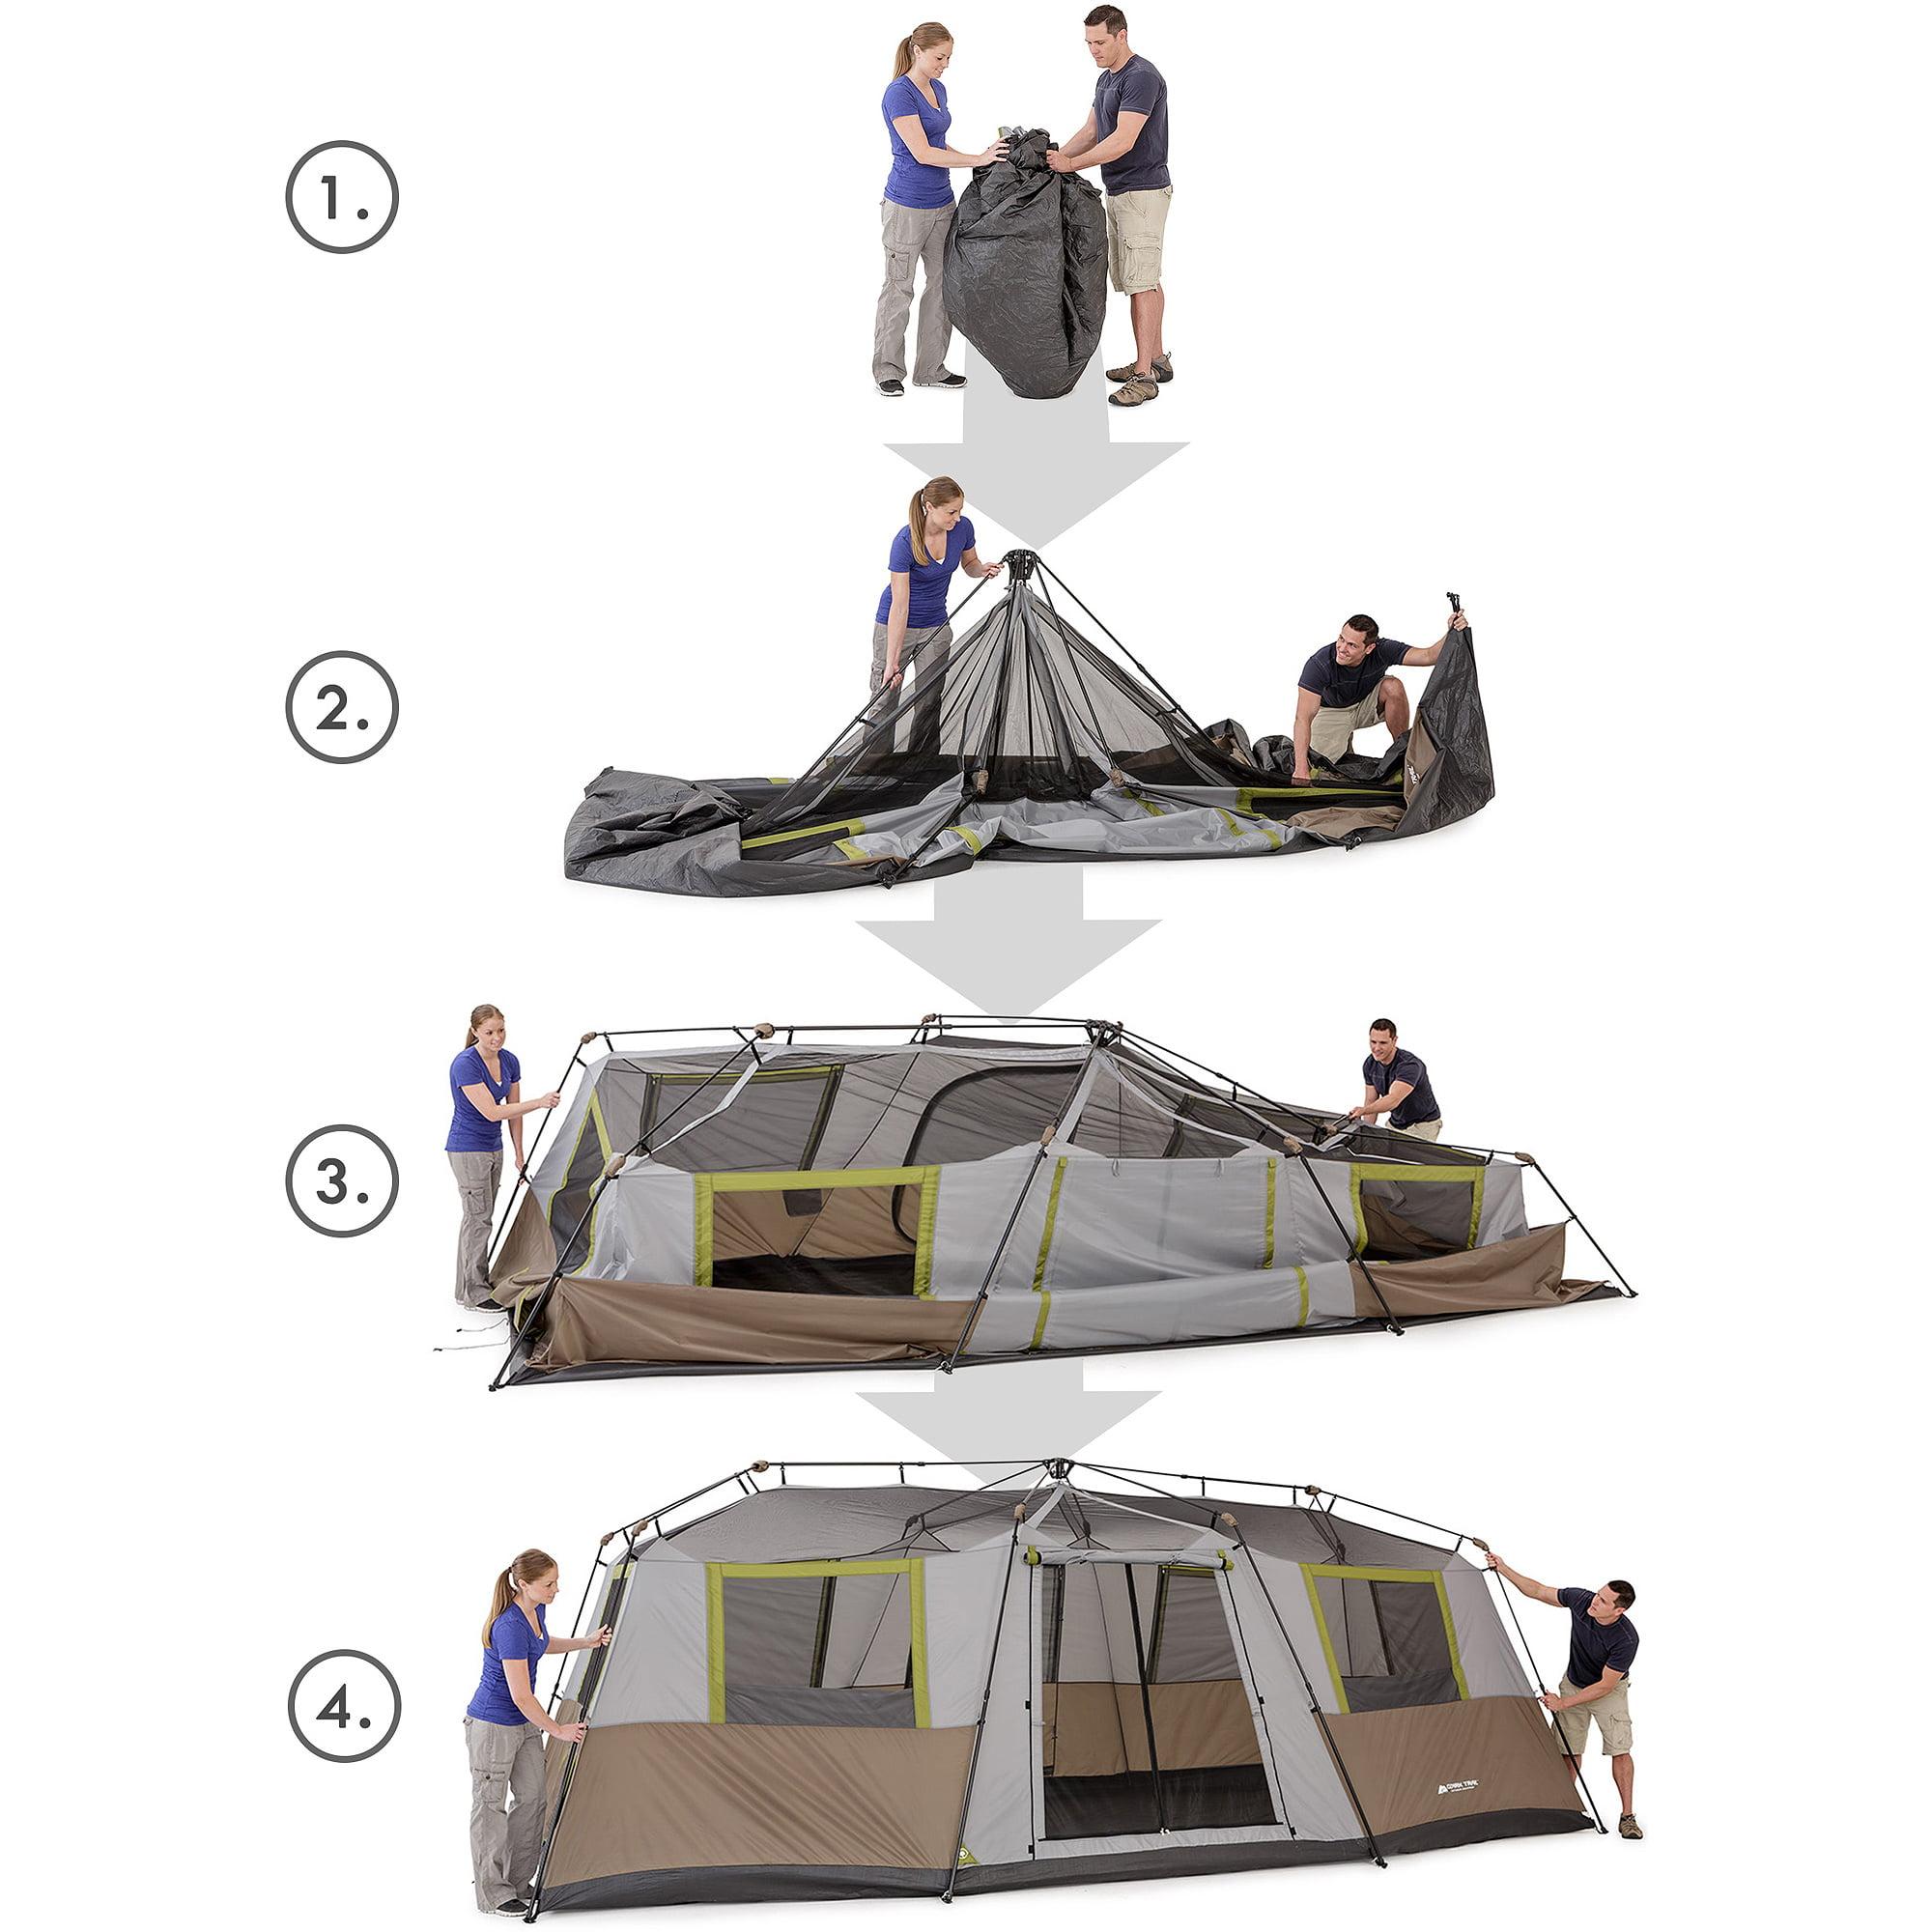 sc 1 st  Walmart & Ozark Trail 10 Person Instant Cabin Tent - Walmart.com